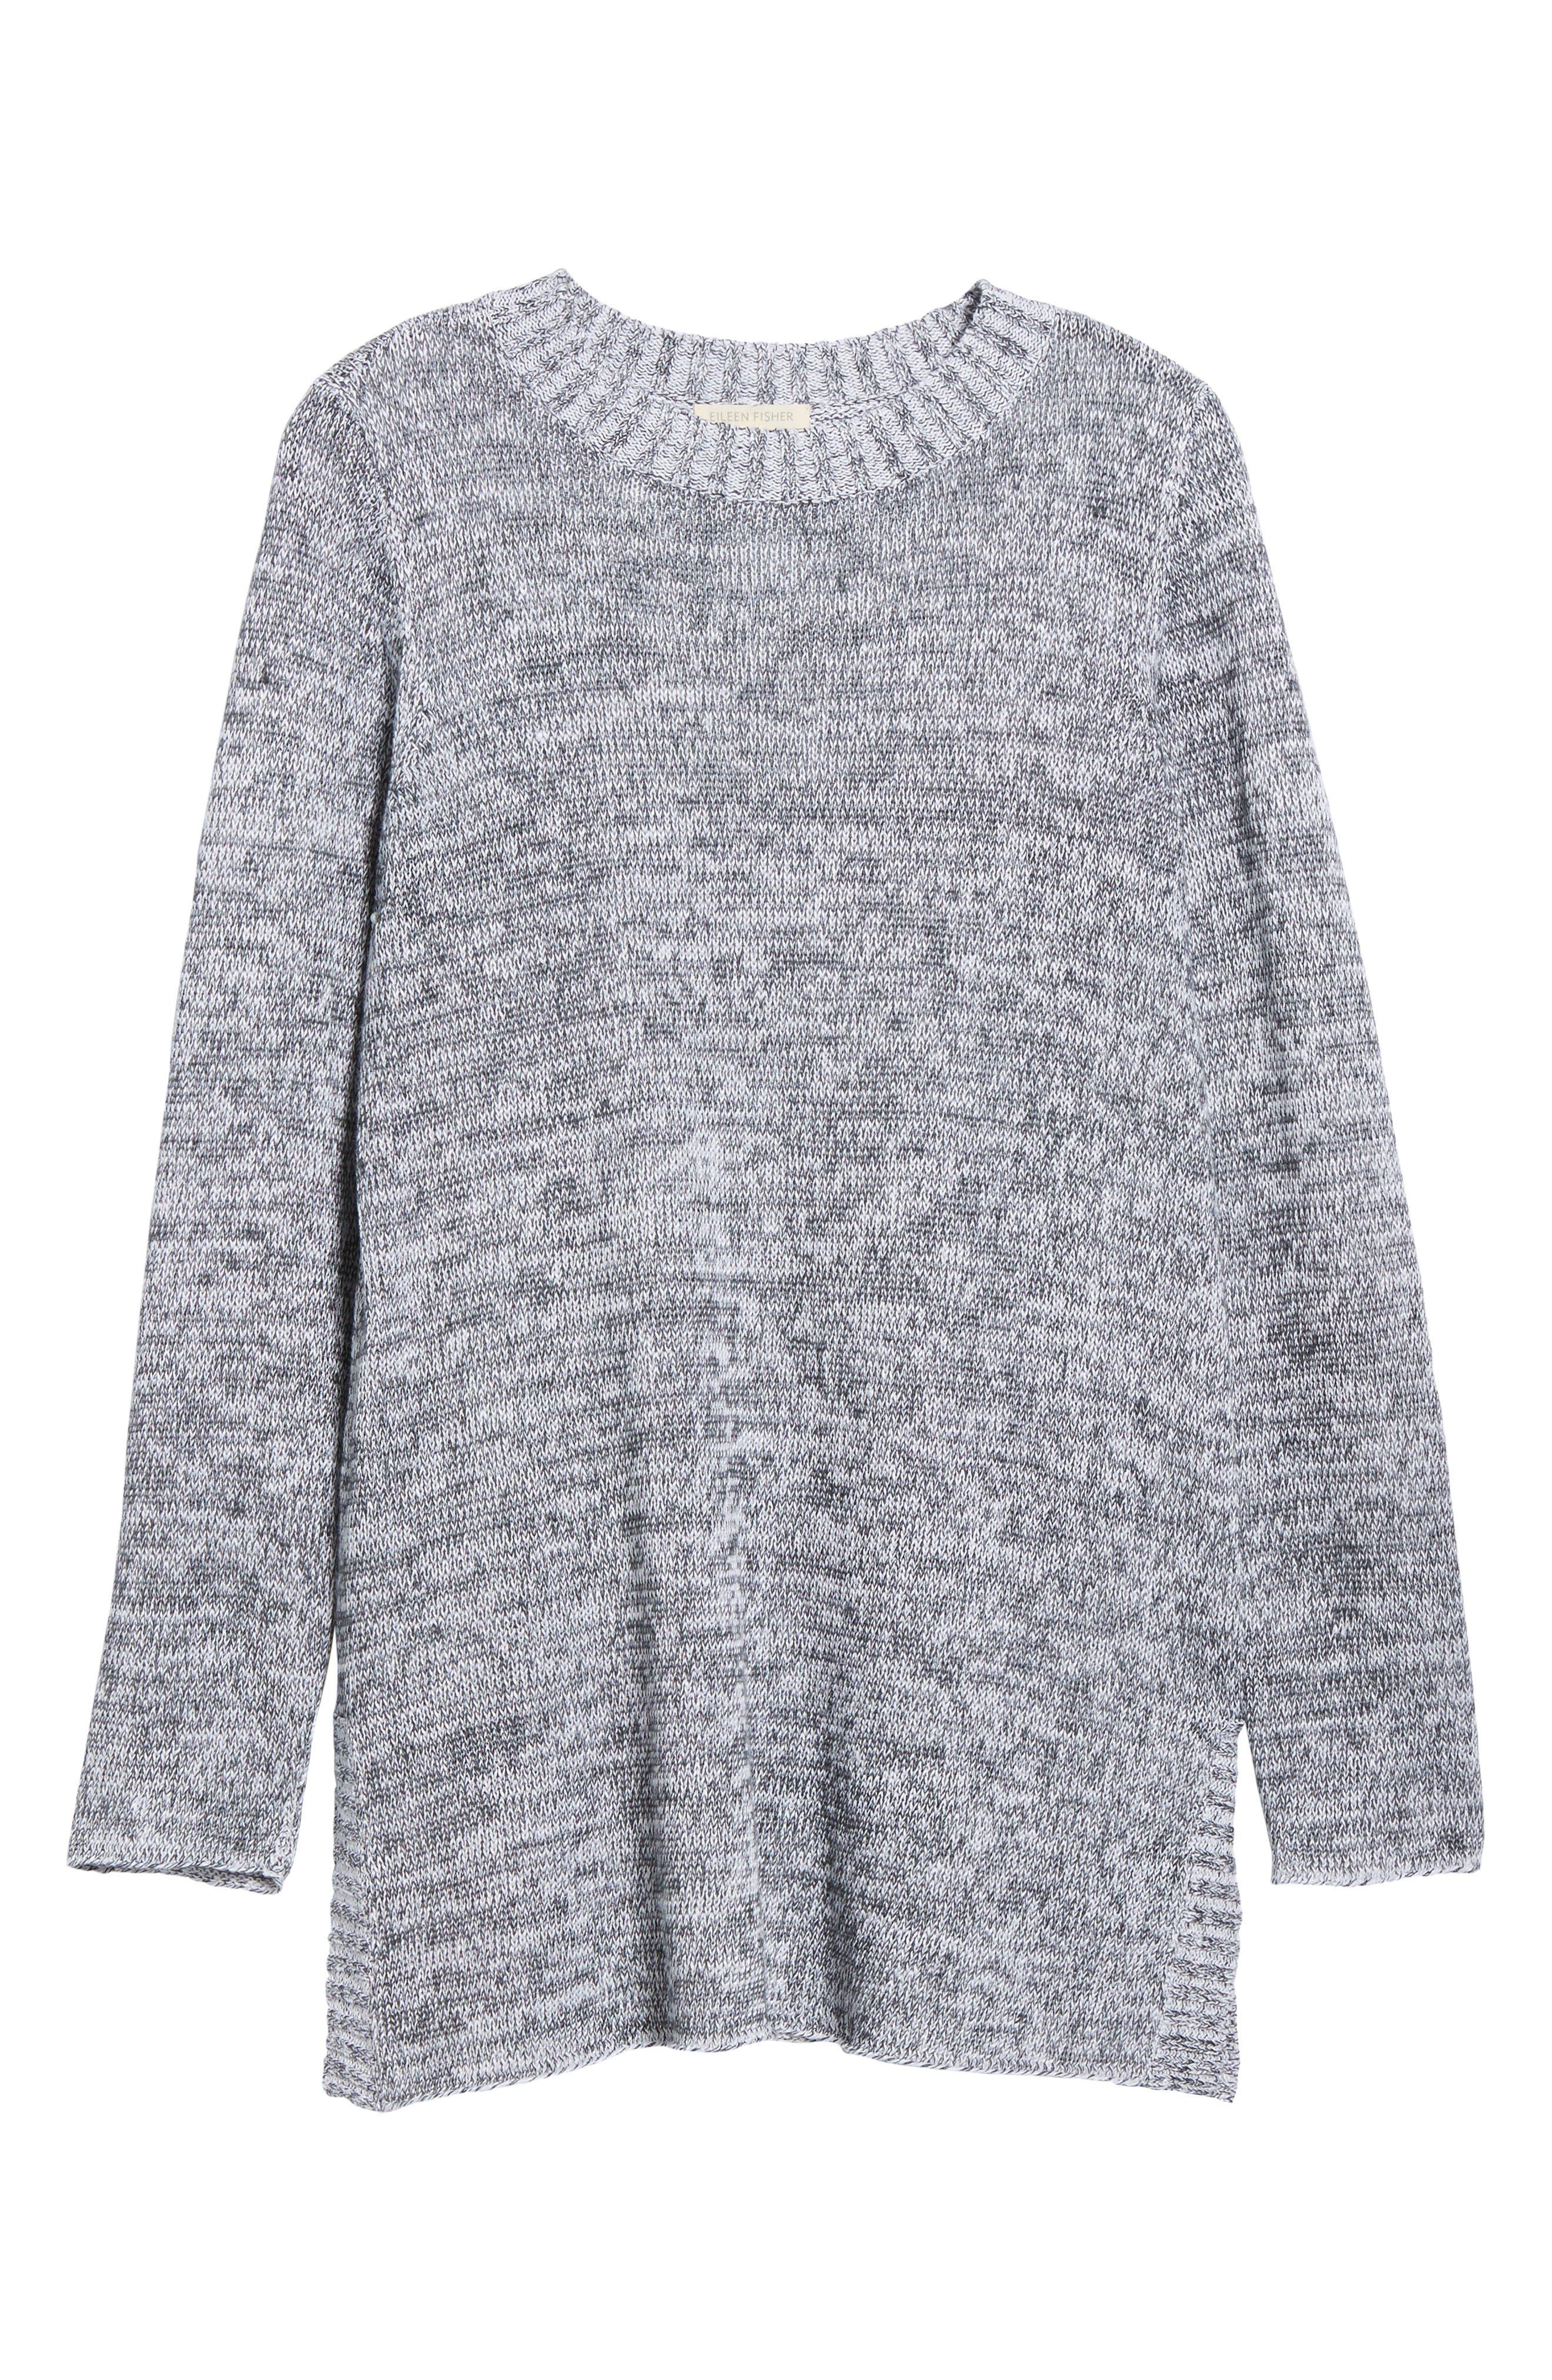 Organic Linen Crewneck Sweater,                             Alternate thumbnail 6, color,